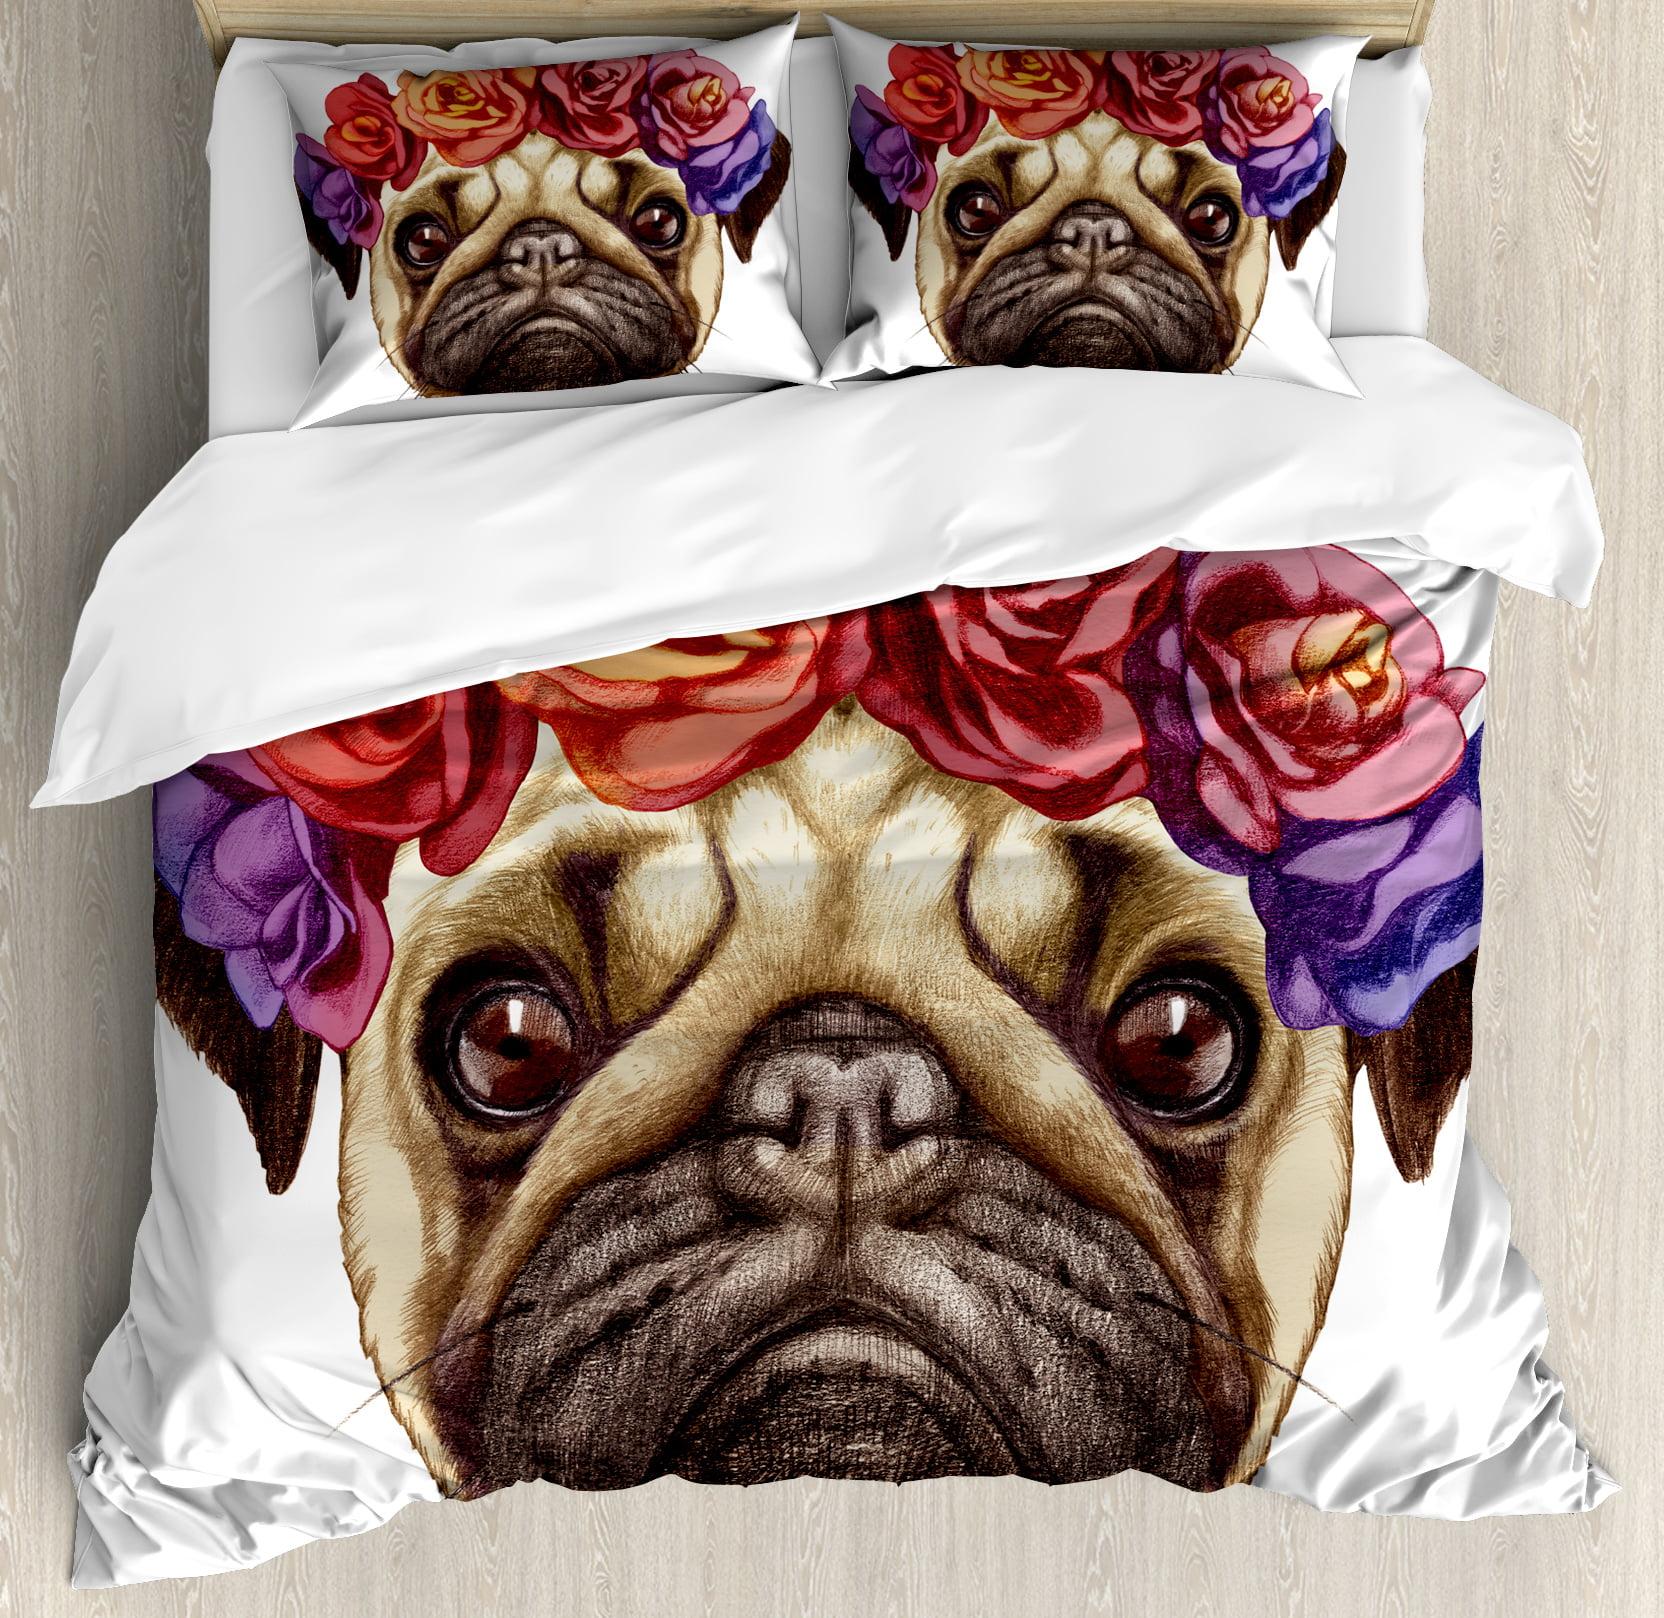 Pug King Size Duvet Cover Set, Floral Head Wreath on Head...